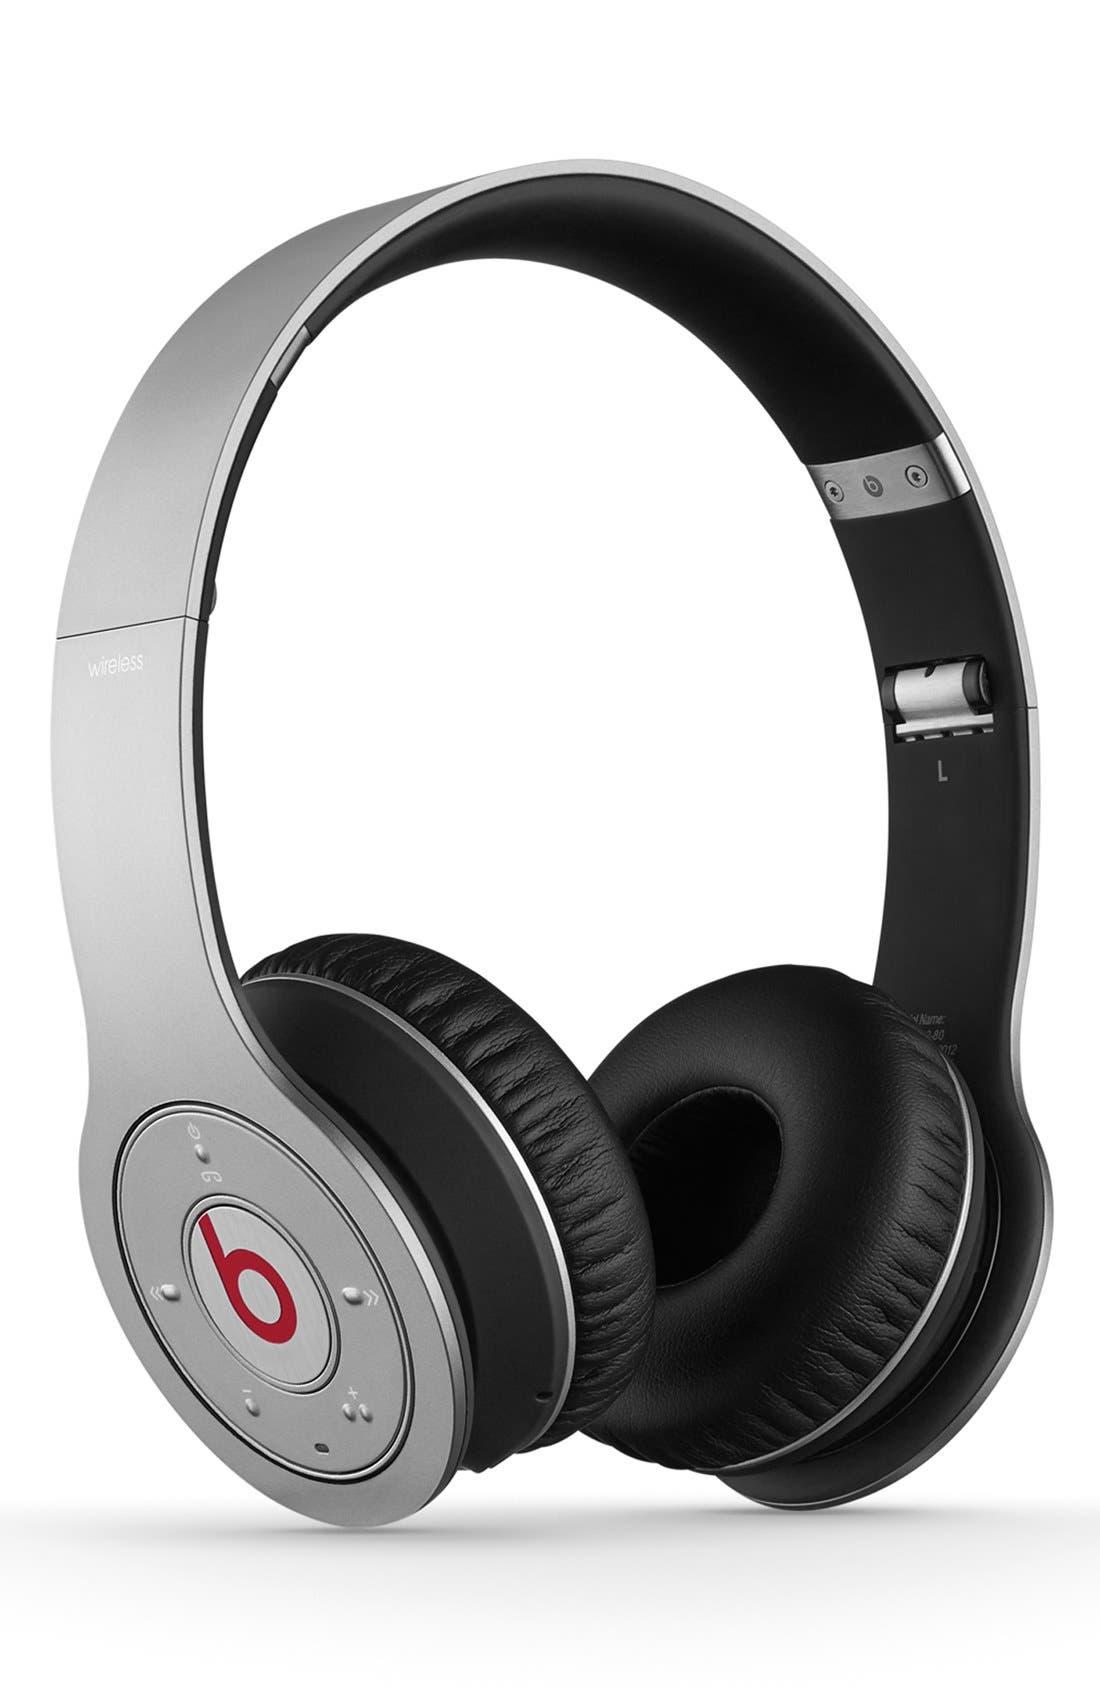 Wireless headphones bass hi def - monster high performance headphones